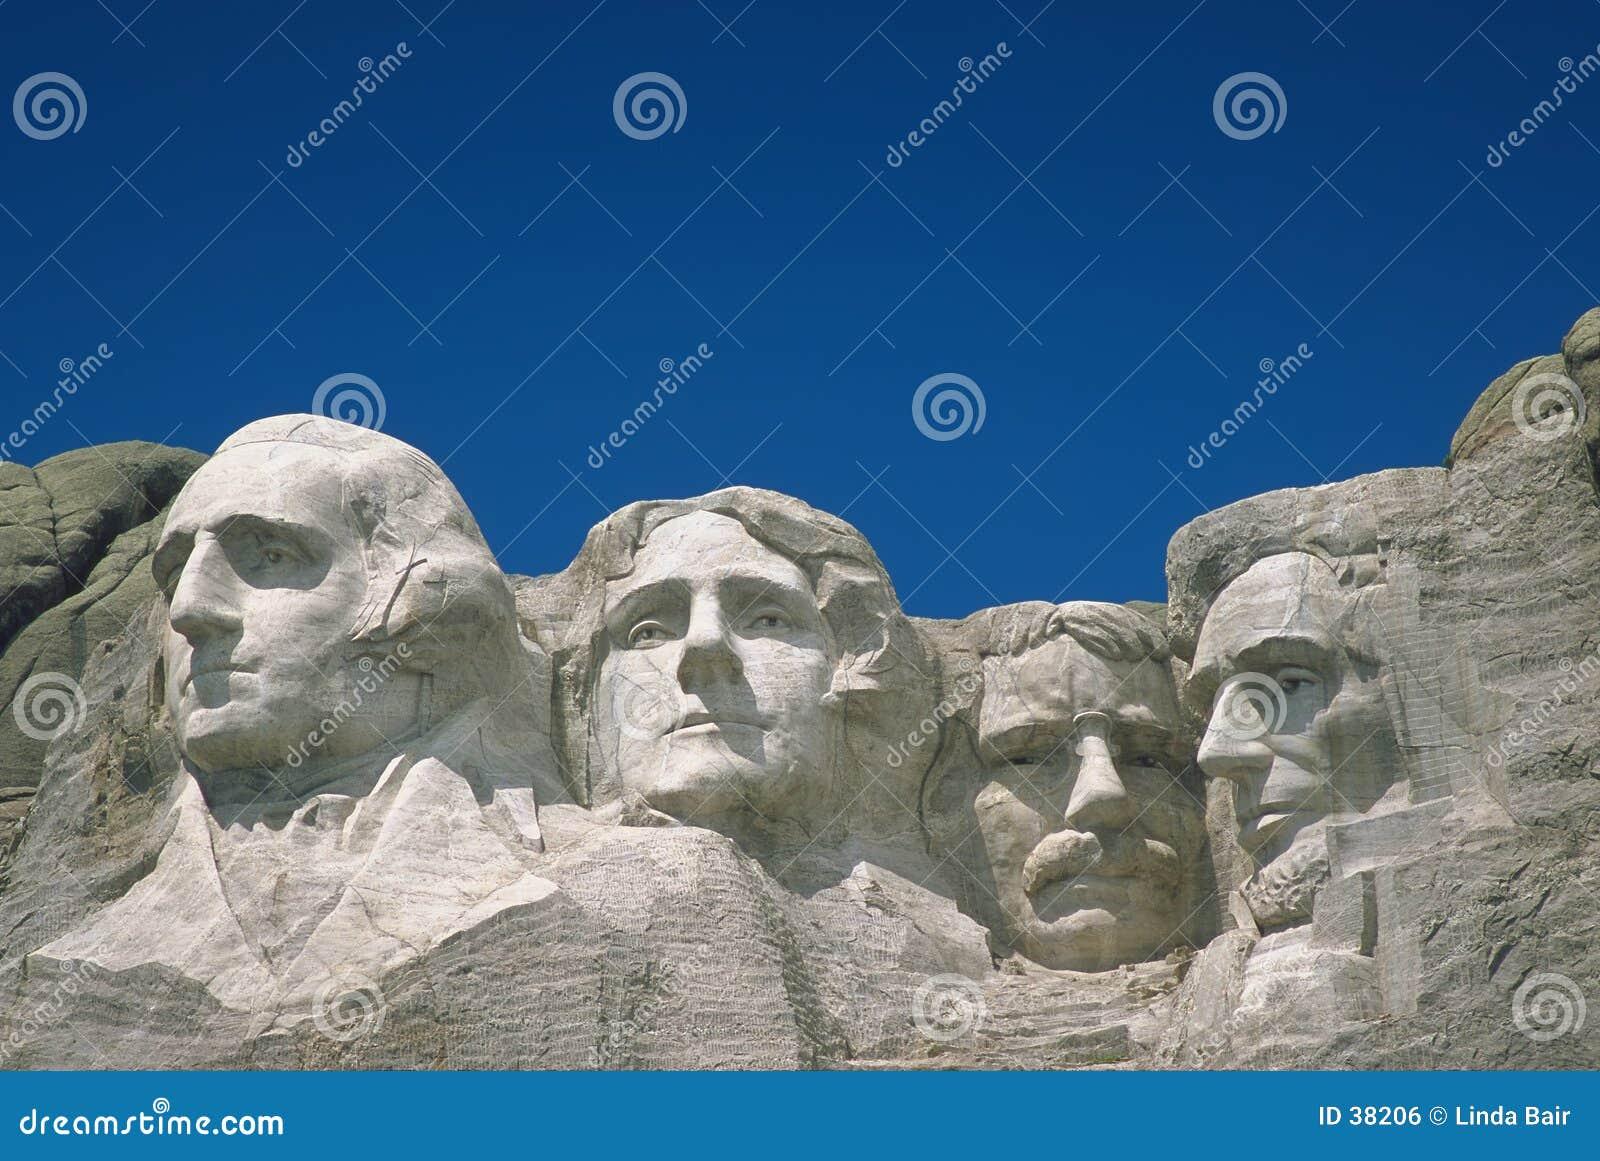 Zet Rushmore op